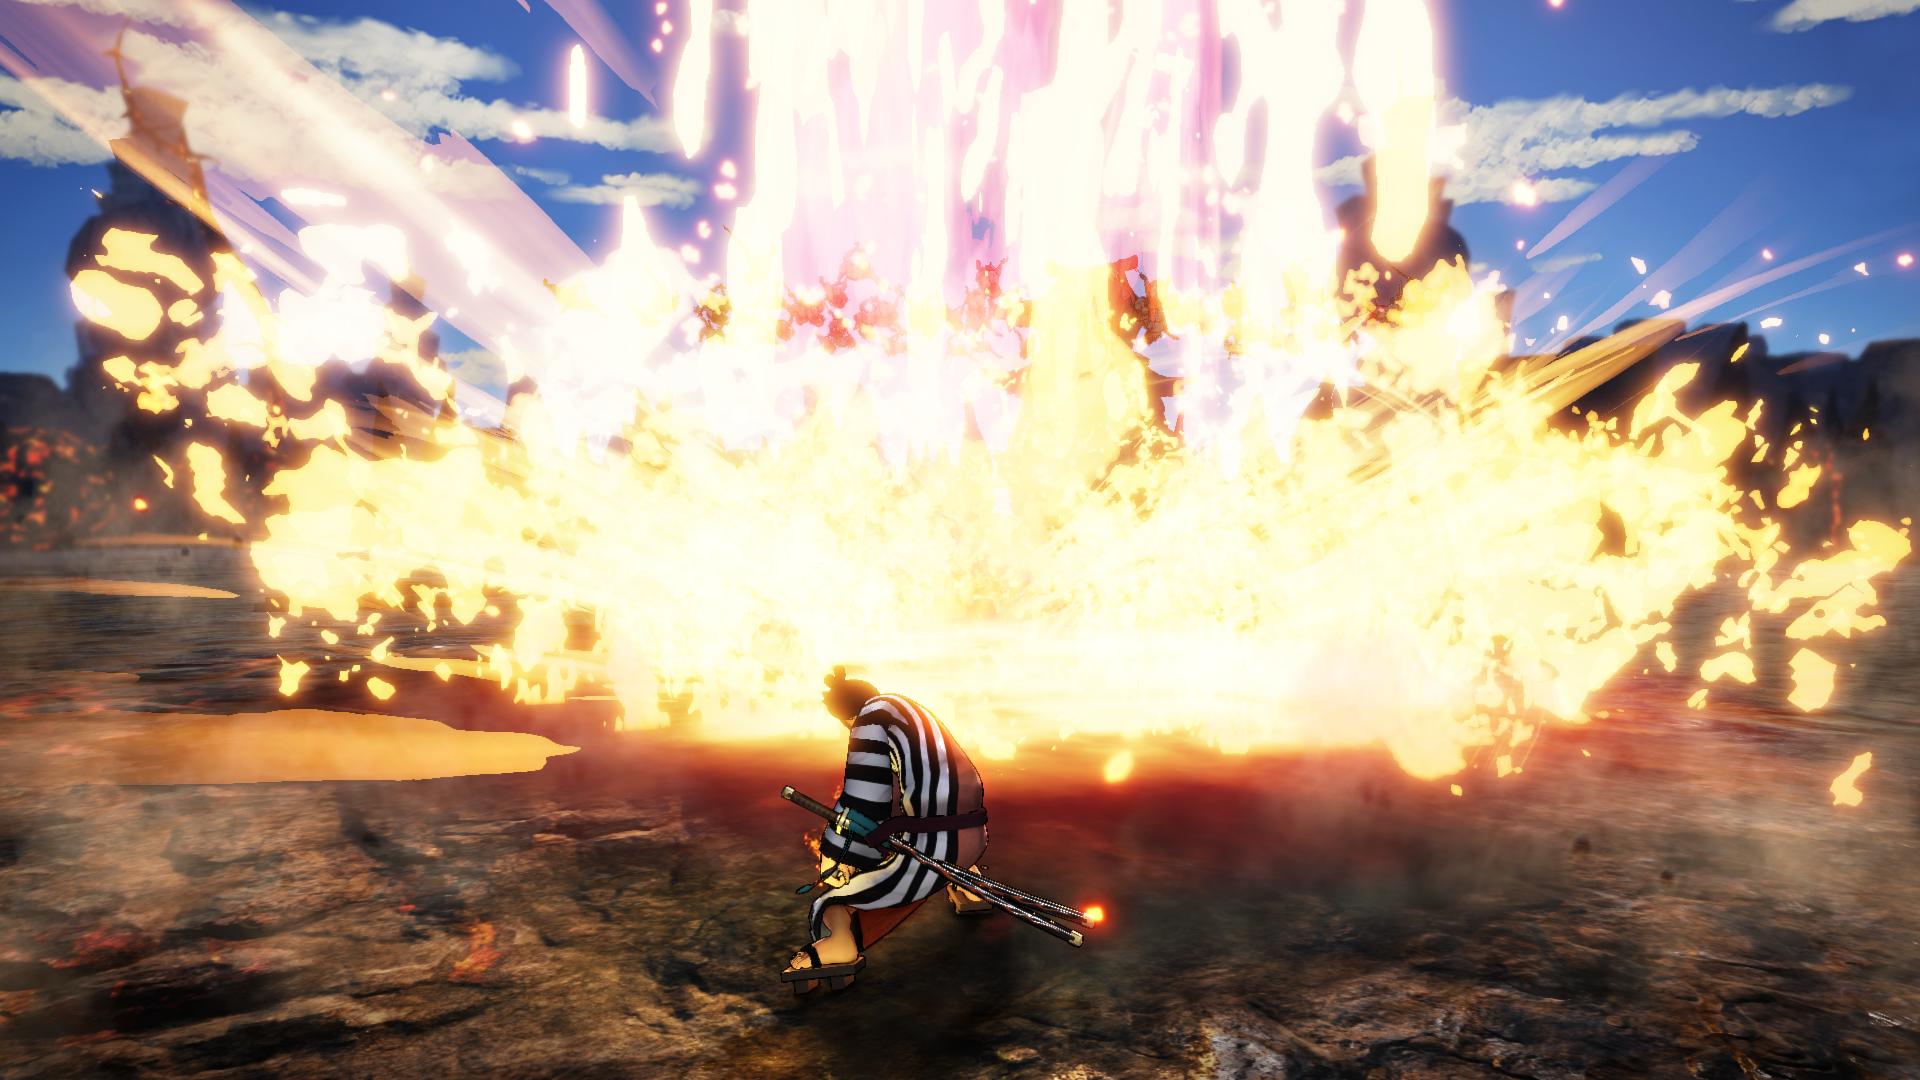 One-Piece-Pirate-Warriors-4_2020_10-11-20_002